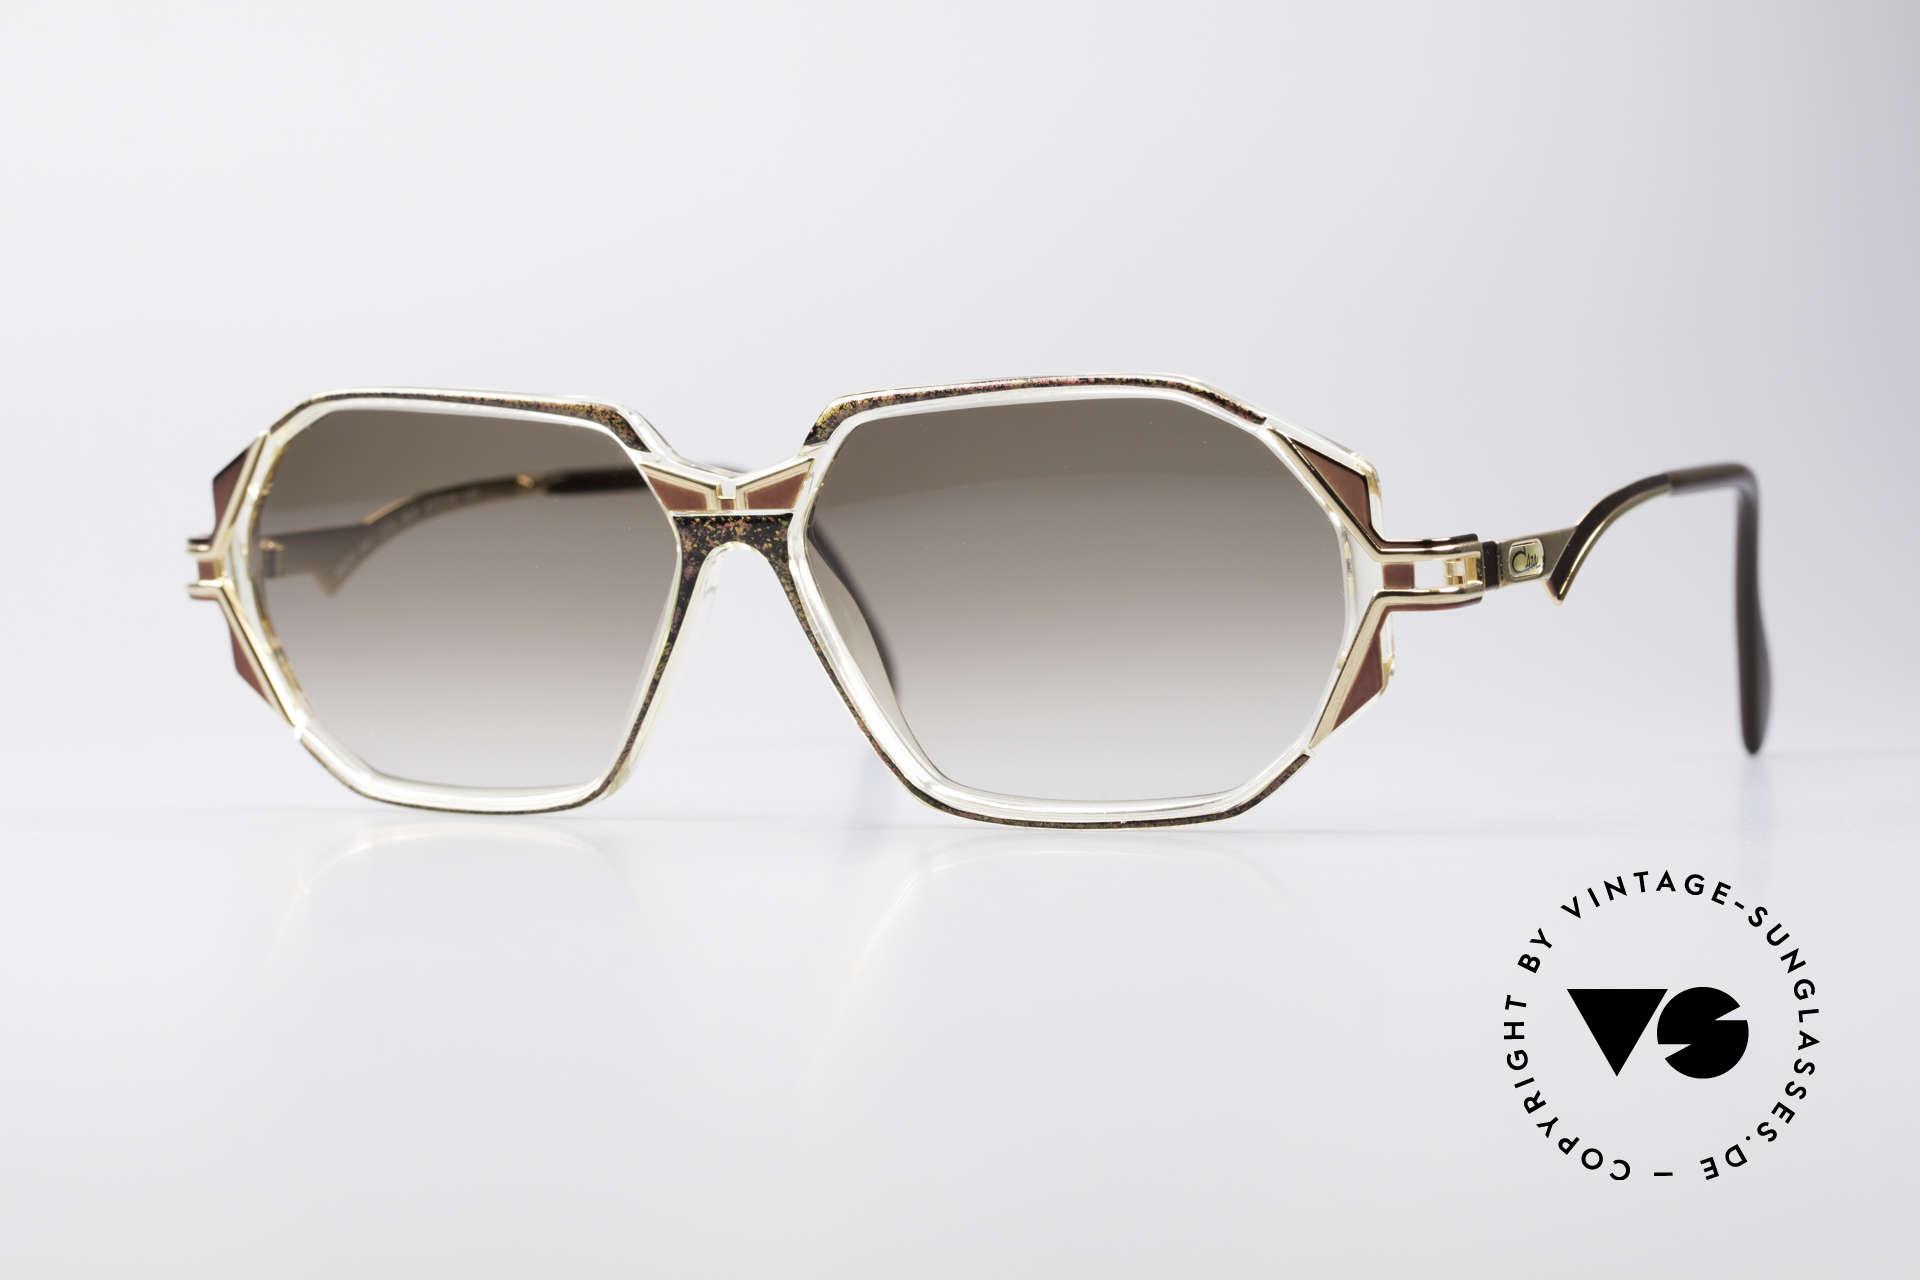 Cazal 361 Original Designer Sunglasses, adorned CAZAL sunglasses from the early / mid 1990's, Made for Women